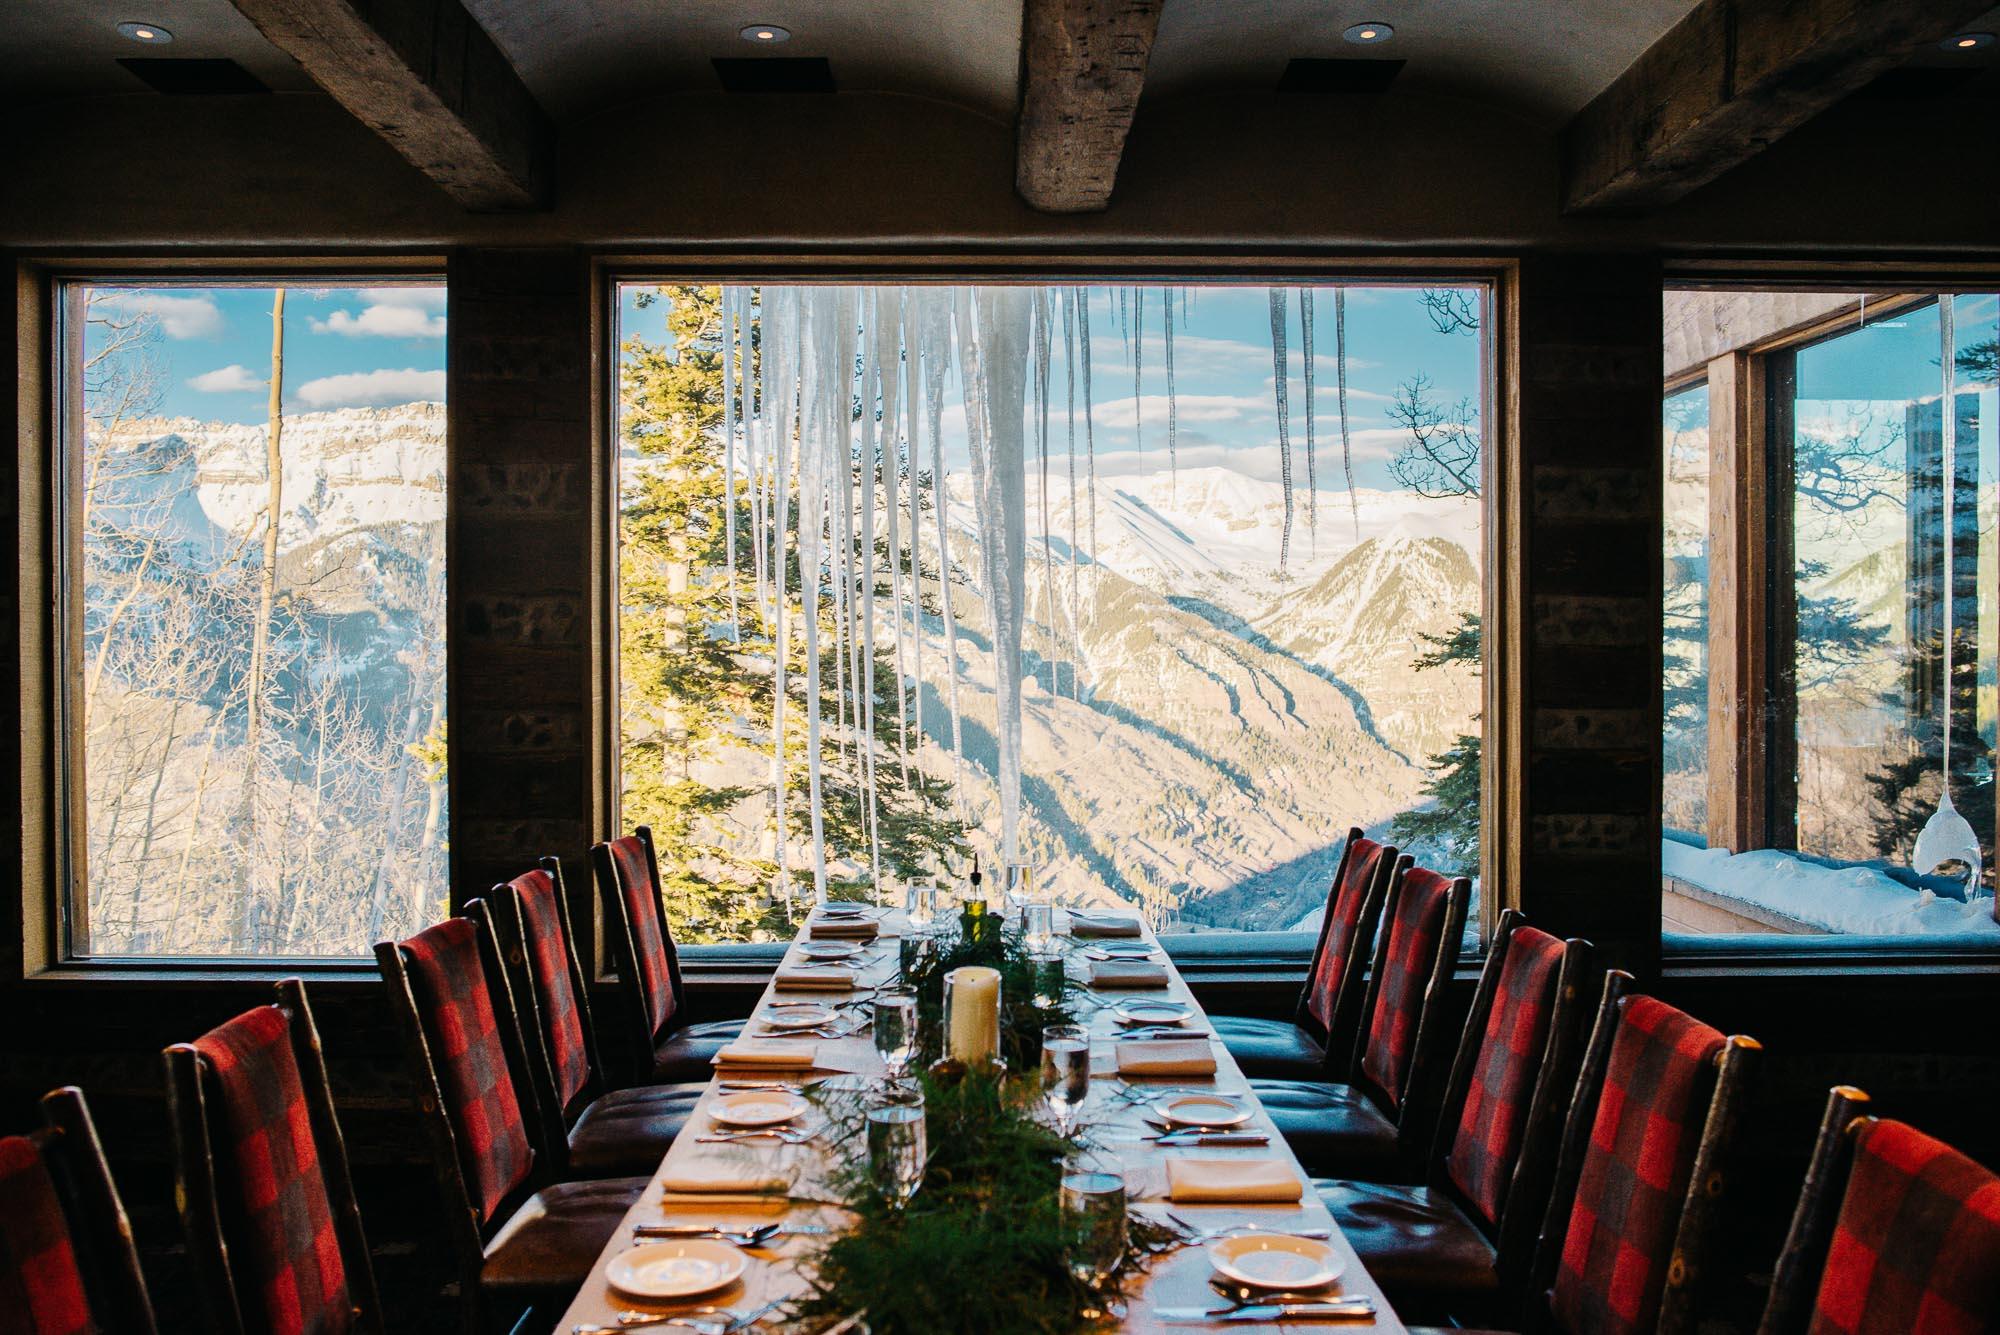 134elopement-photographer-colorado-telluride-winter-wedding-mountain-wedding-photographer-paige&chad-0974-2.jpg